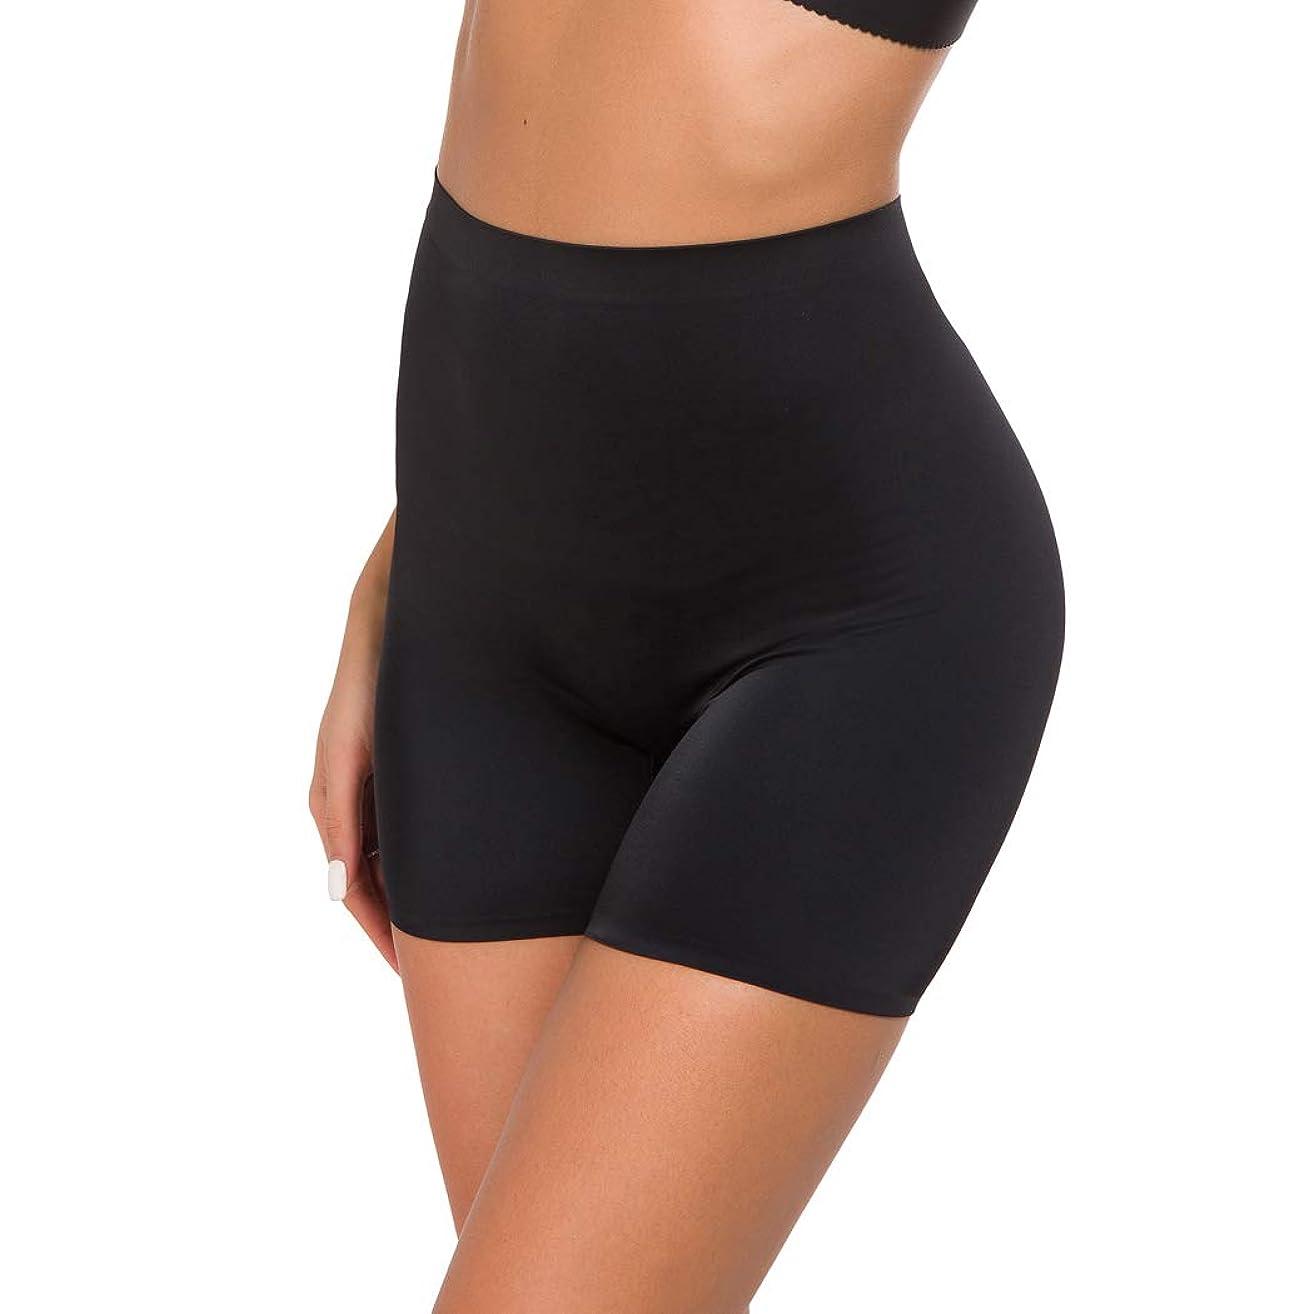 Women's Shapewear Boyshort Hi-Waist Seamless Tummy Control Shaper Panties Mid-Thigh Short